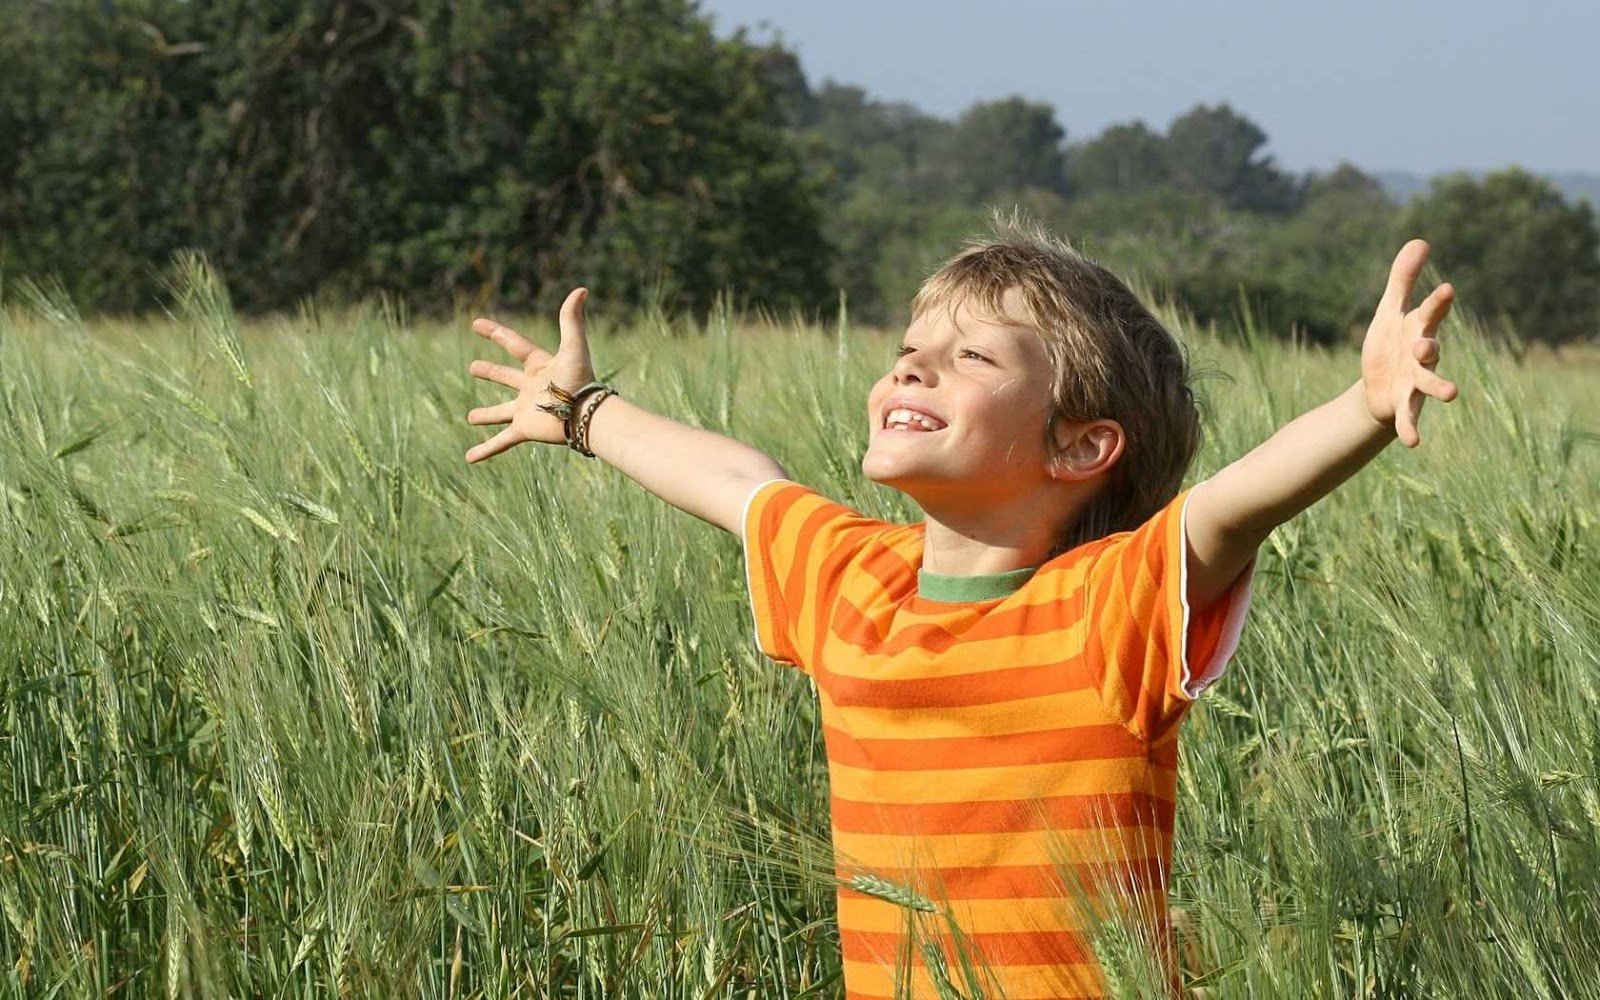 baby_boy_field_grass_54683_1680x1050_optimized.jpg